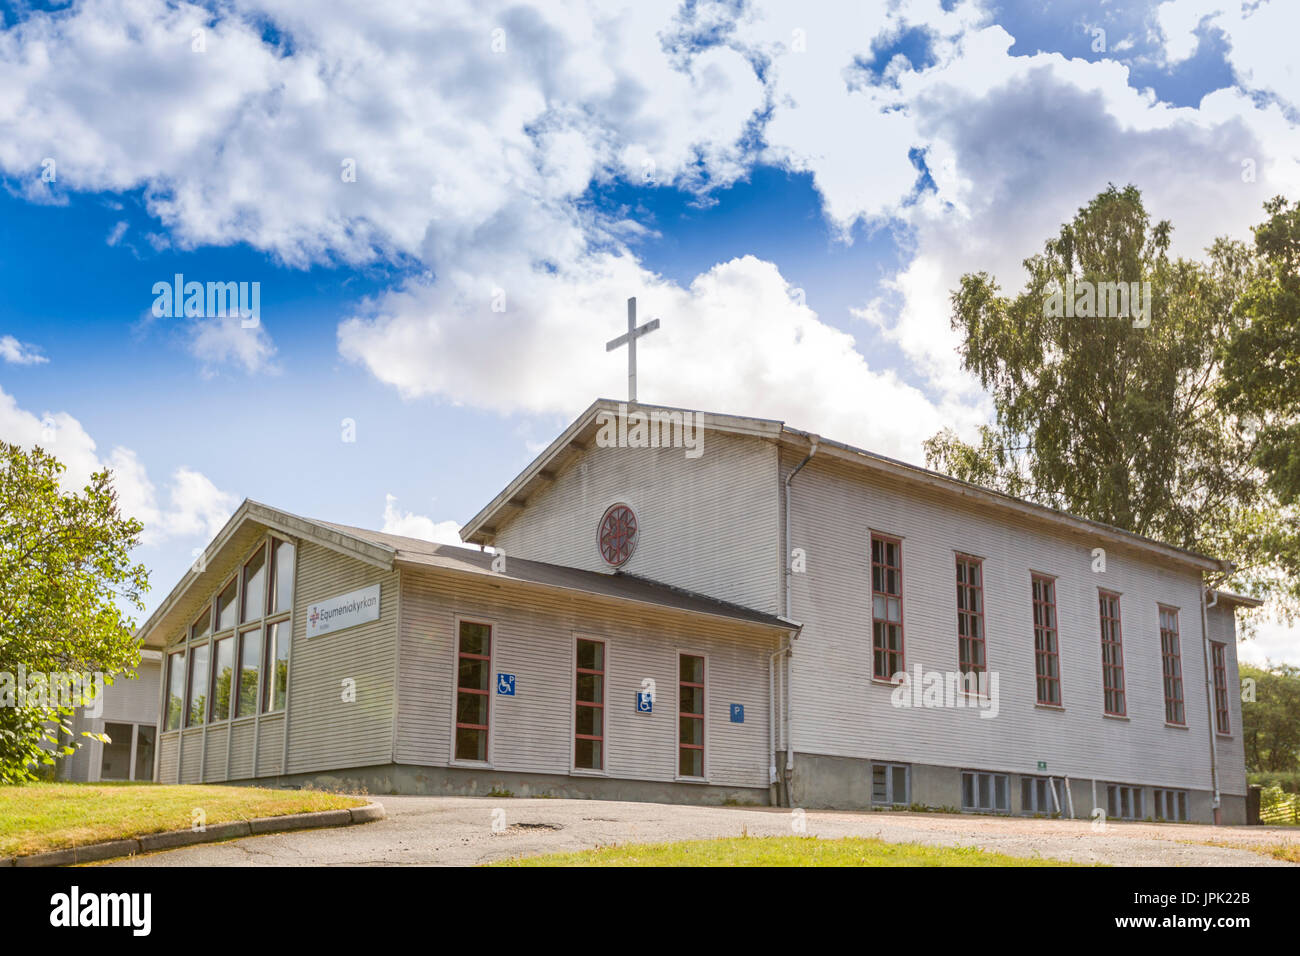 Equmeniakyrkan - Uniting Church in Sweden (UCS) church in Floda, Sweden - Stock Image